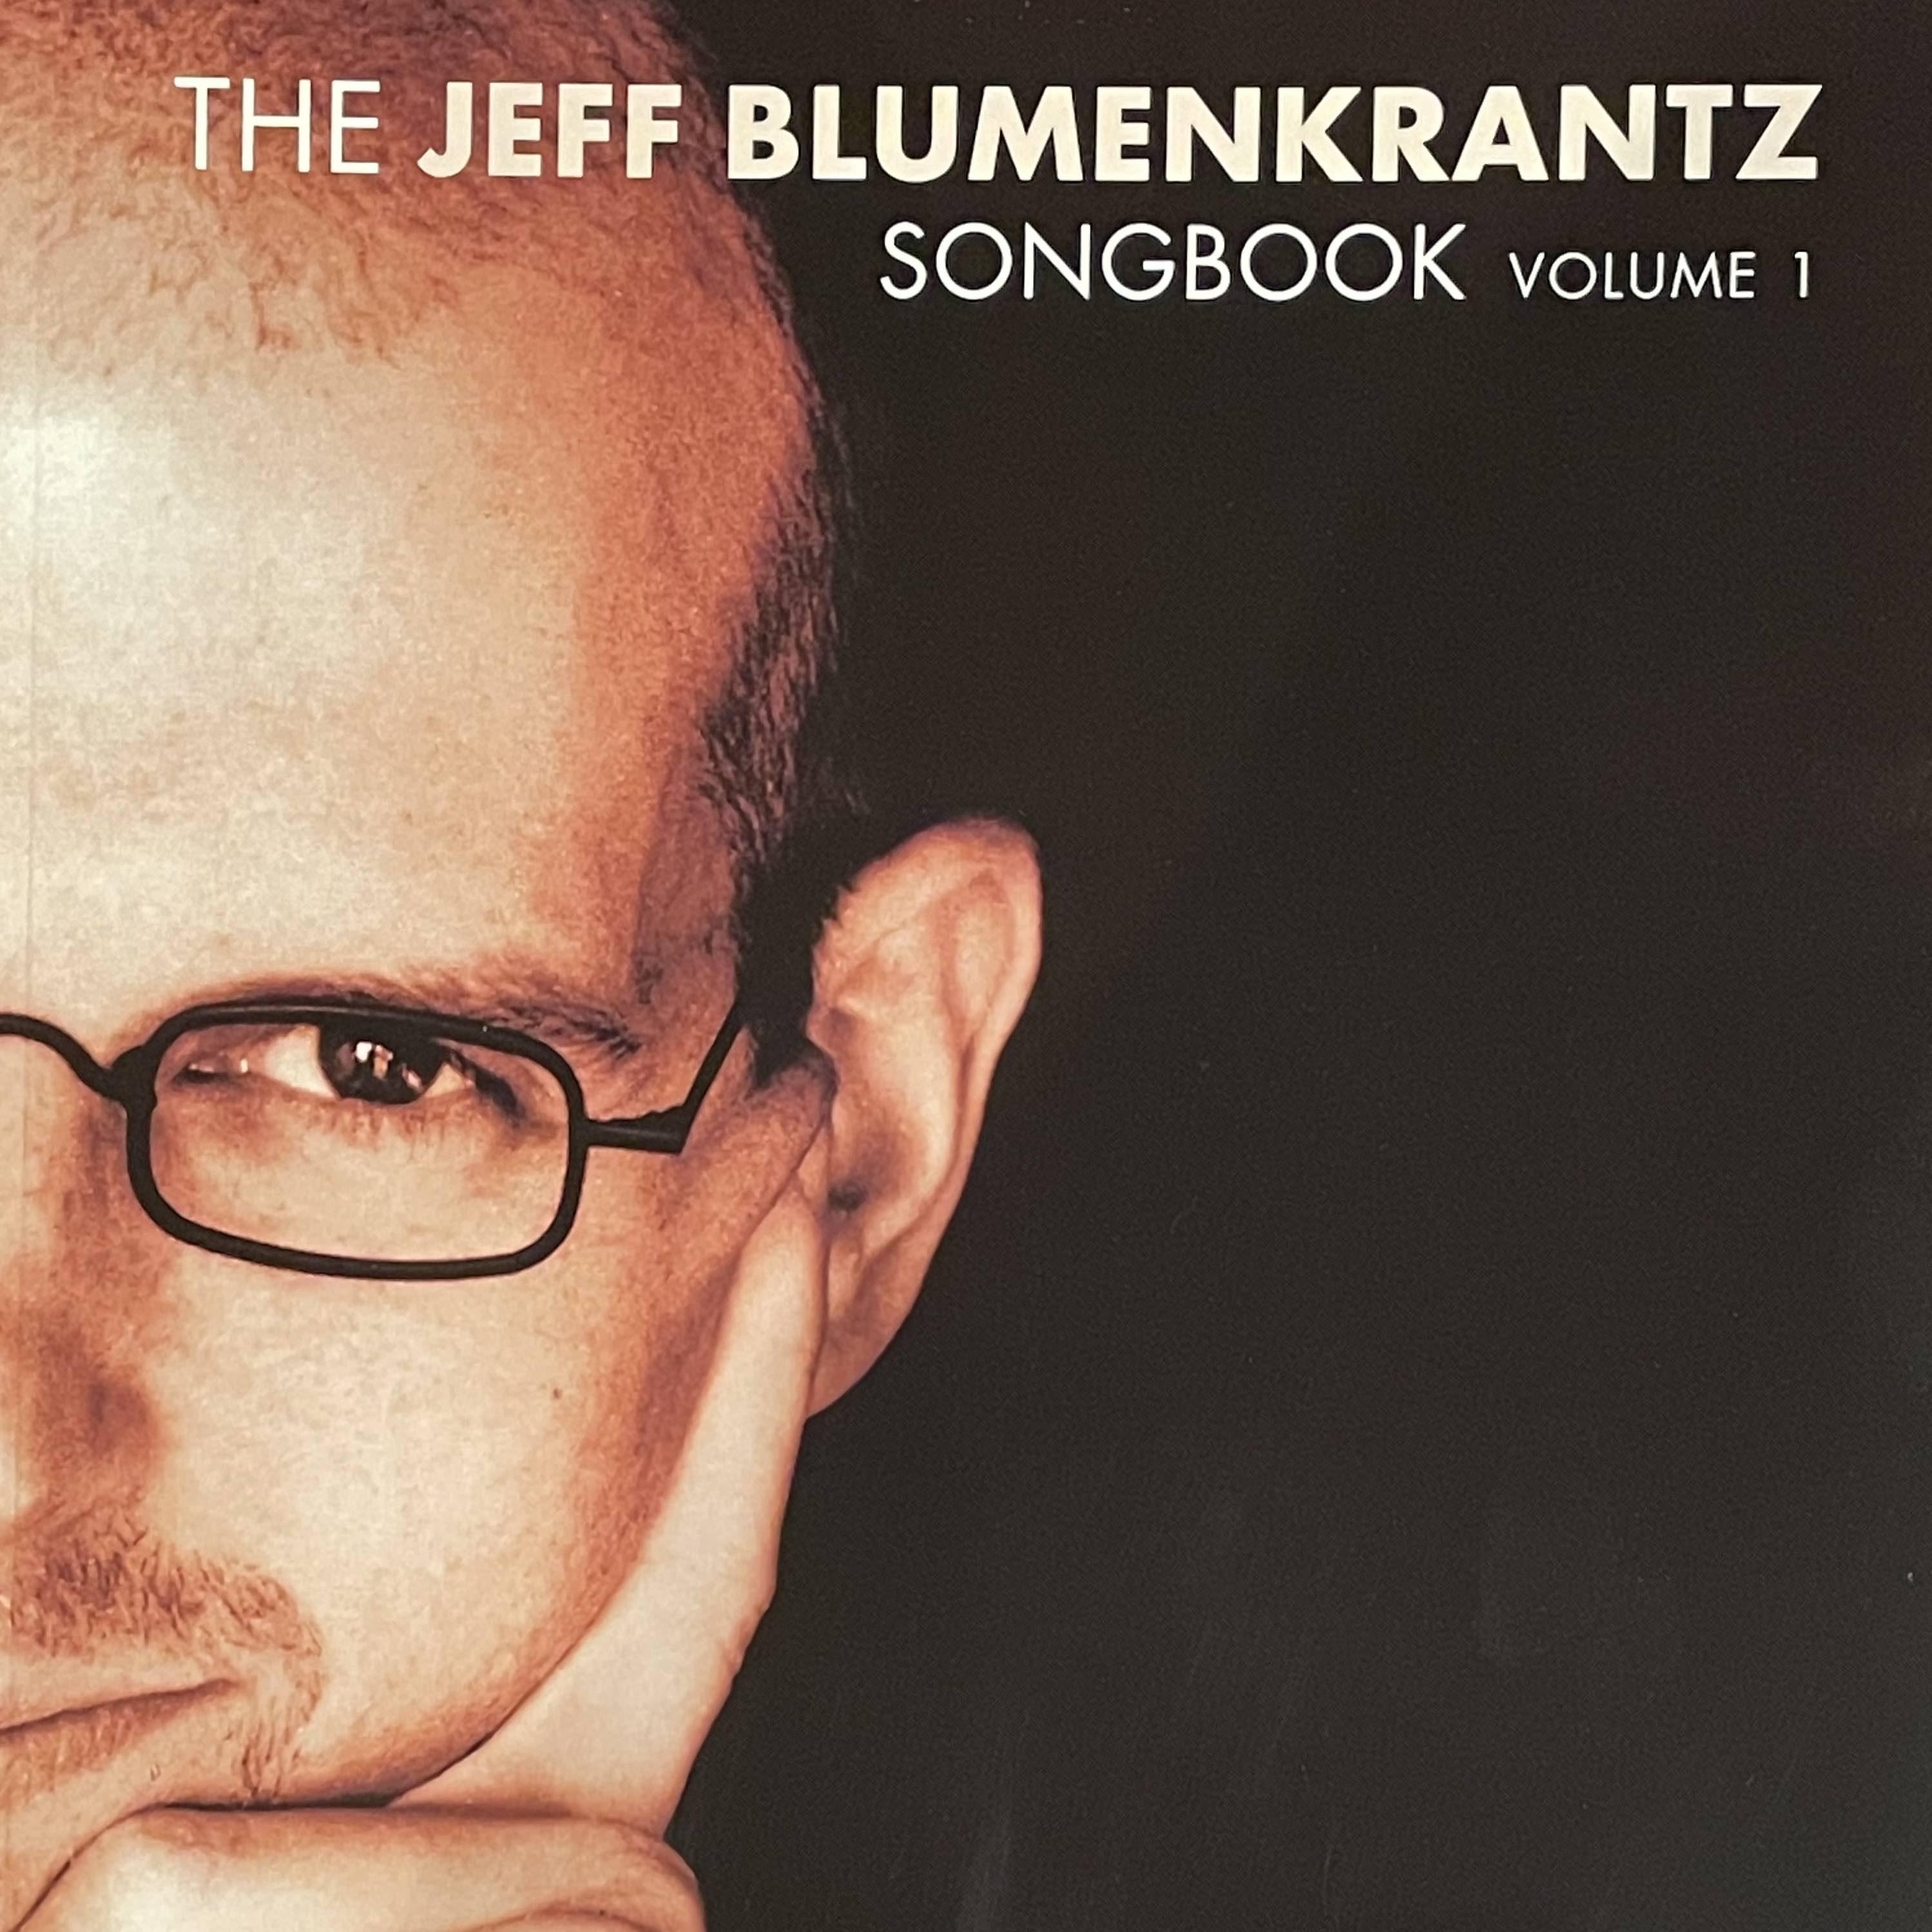 The Jeff Blumenkrantz Songbook Podcast